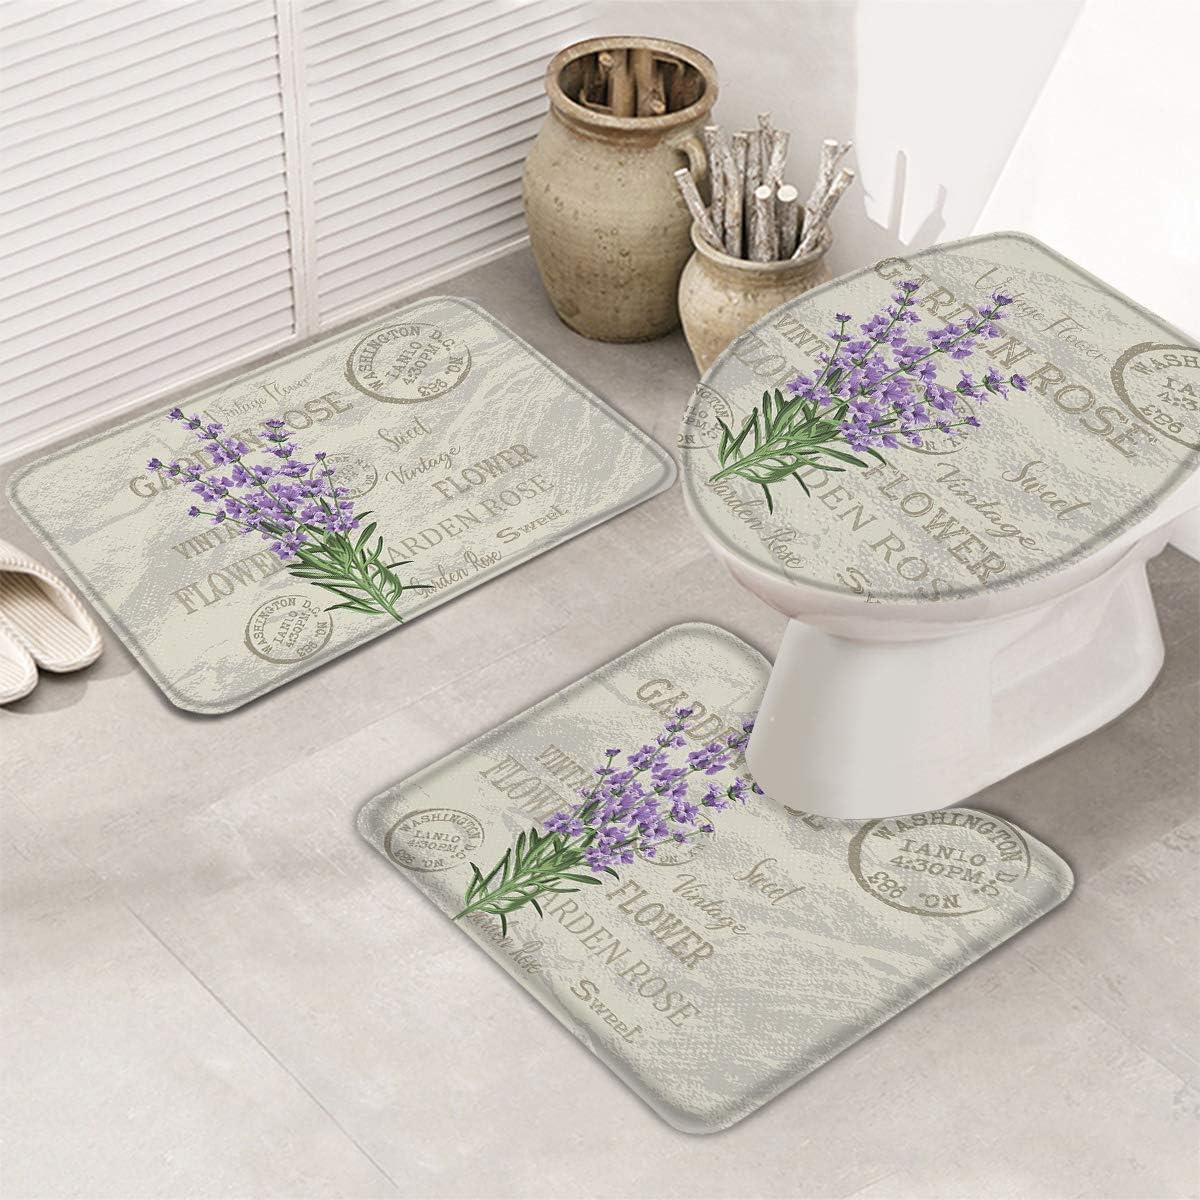 Postcard Purple Lavender Non Slip Bathroom Rug+U-Shaped Contour Toilet Mat+Toilet Lid Cover Absorbent/&Washable 3 Pcs Mats Set for Bathroom//Home Bath Rugs Mats Set of 3